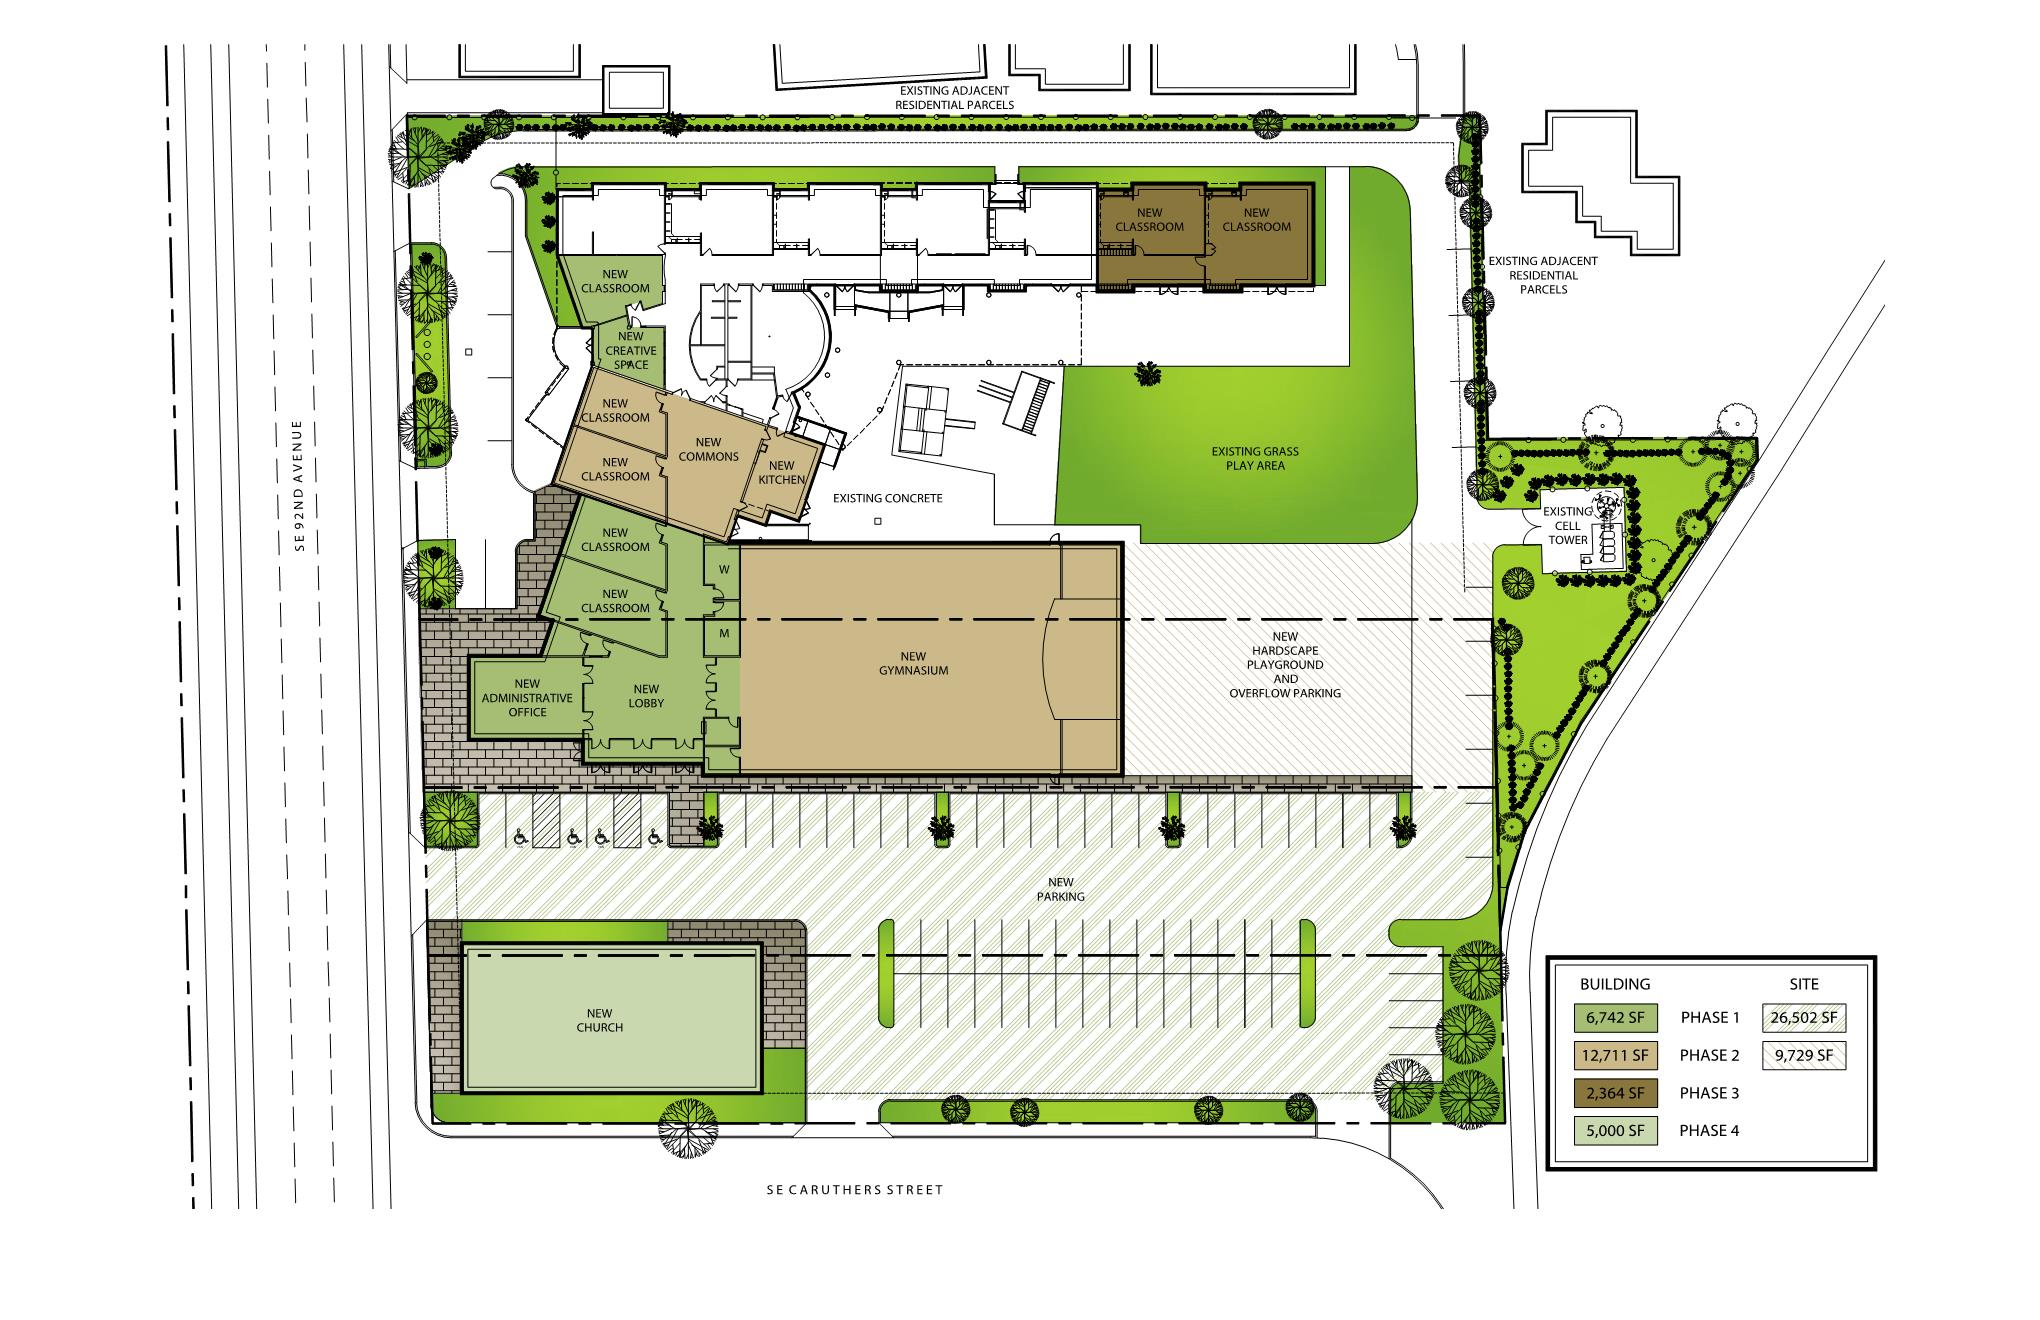 SITE PLAN NEW 11x17 2012-10-04.jpg